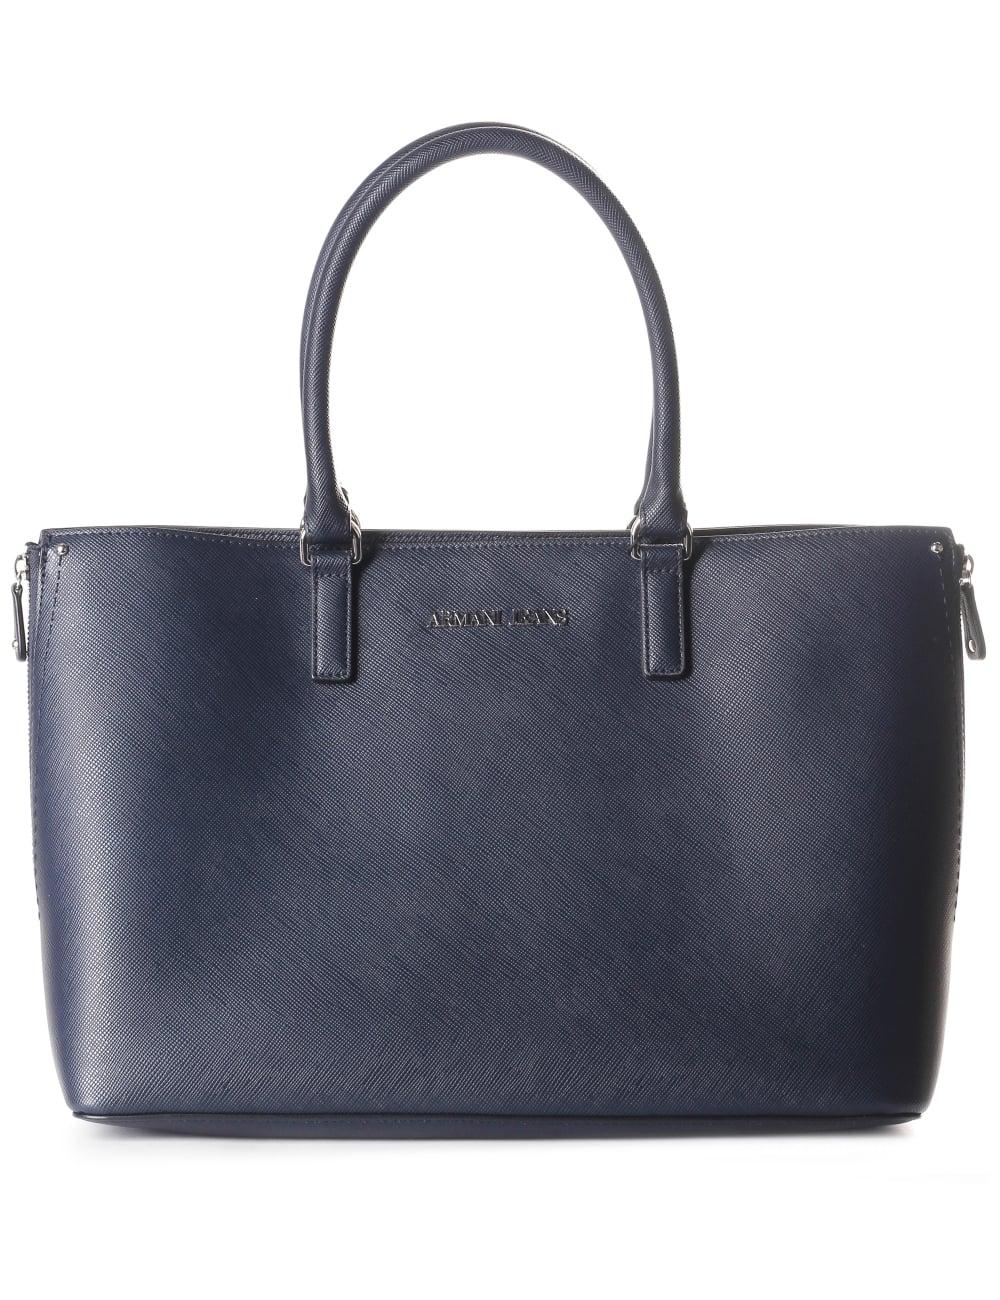 armani jeans women 39 s shopper bag. Black Bedroom Furniture Sets. Home Design Ideas